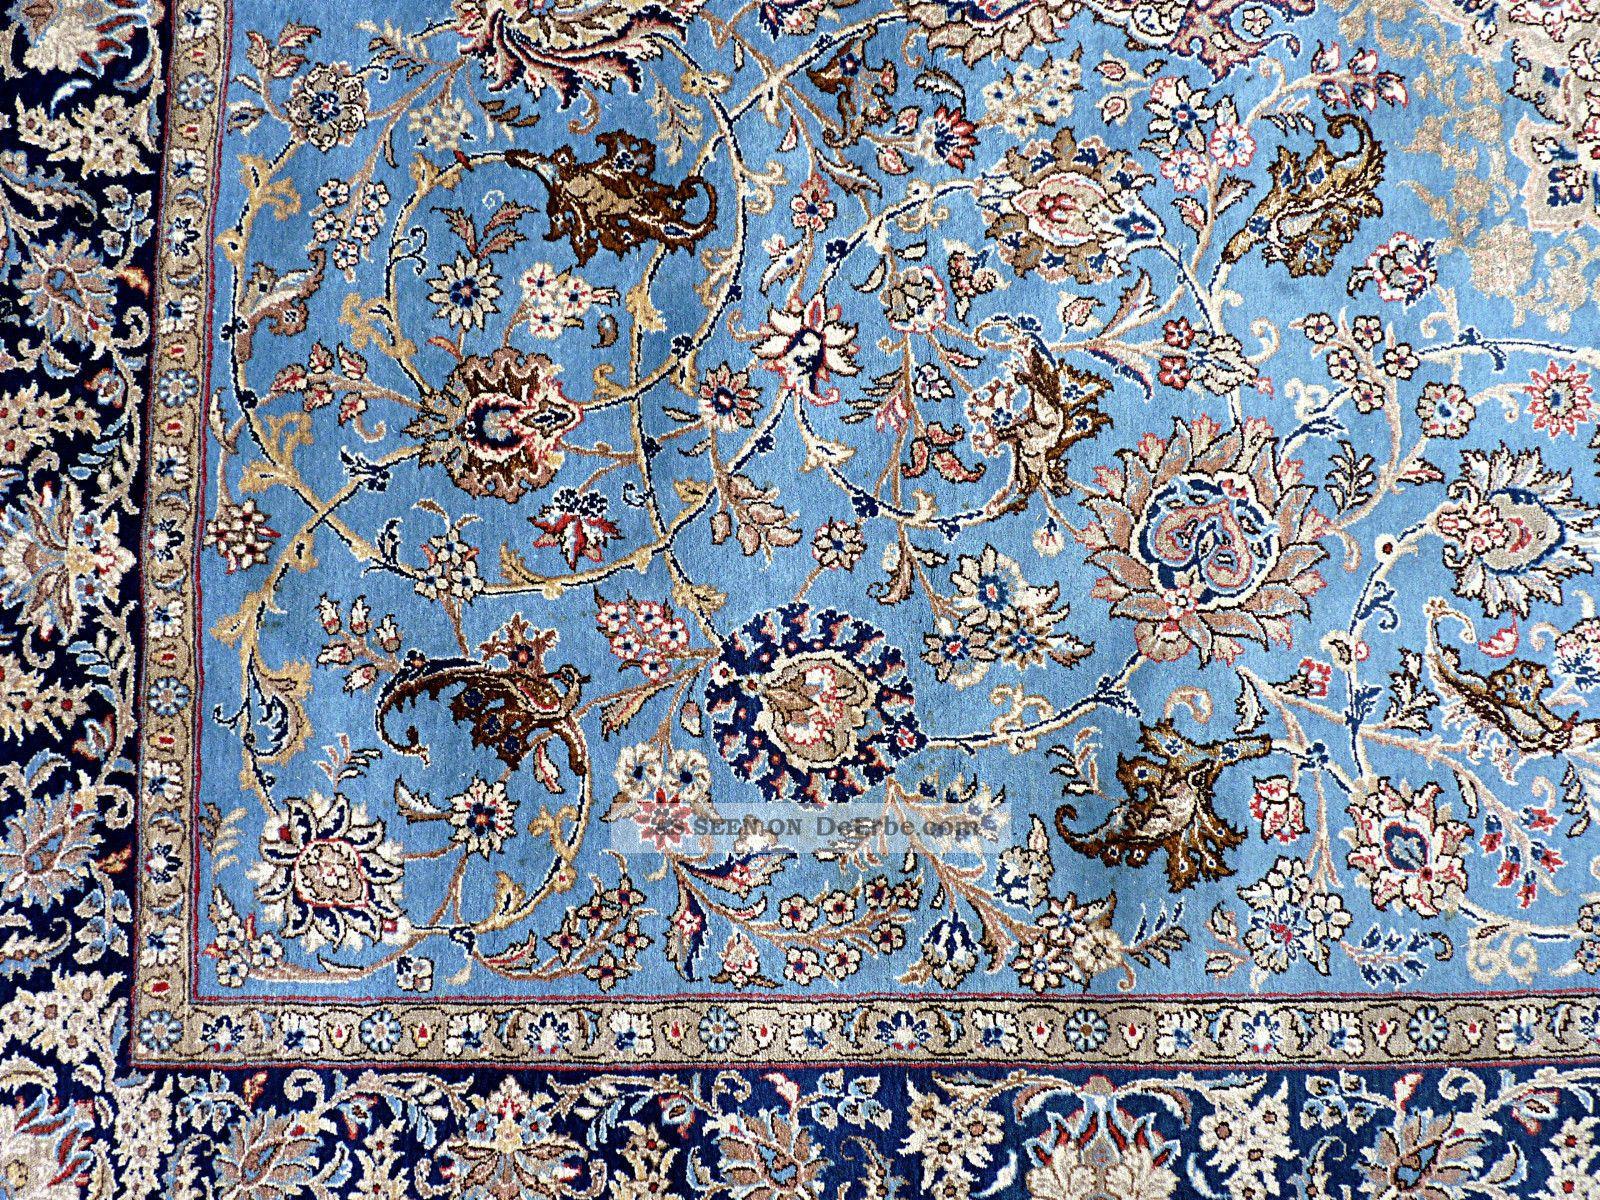 orient teppich perserteppich oriental rug tapis persan ca. Black Bedroom Furniture Sets. Home Design Ideas